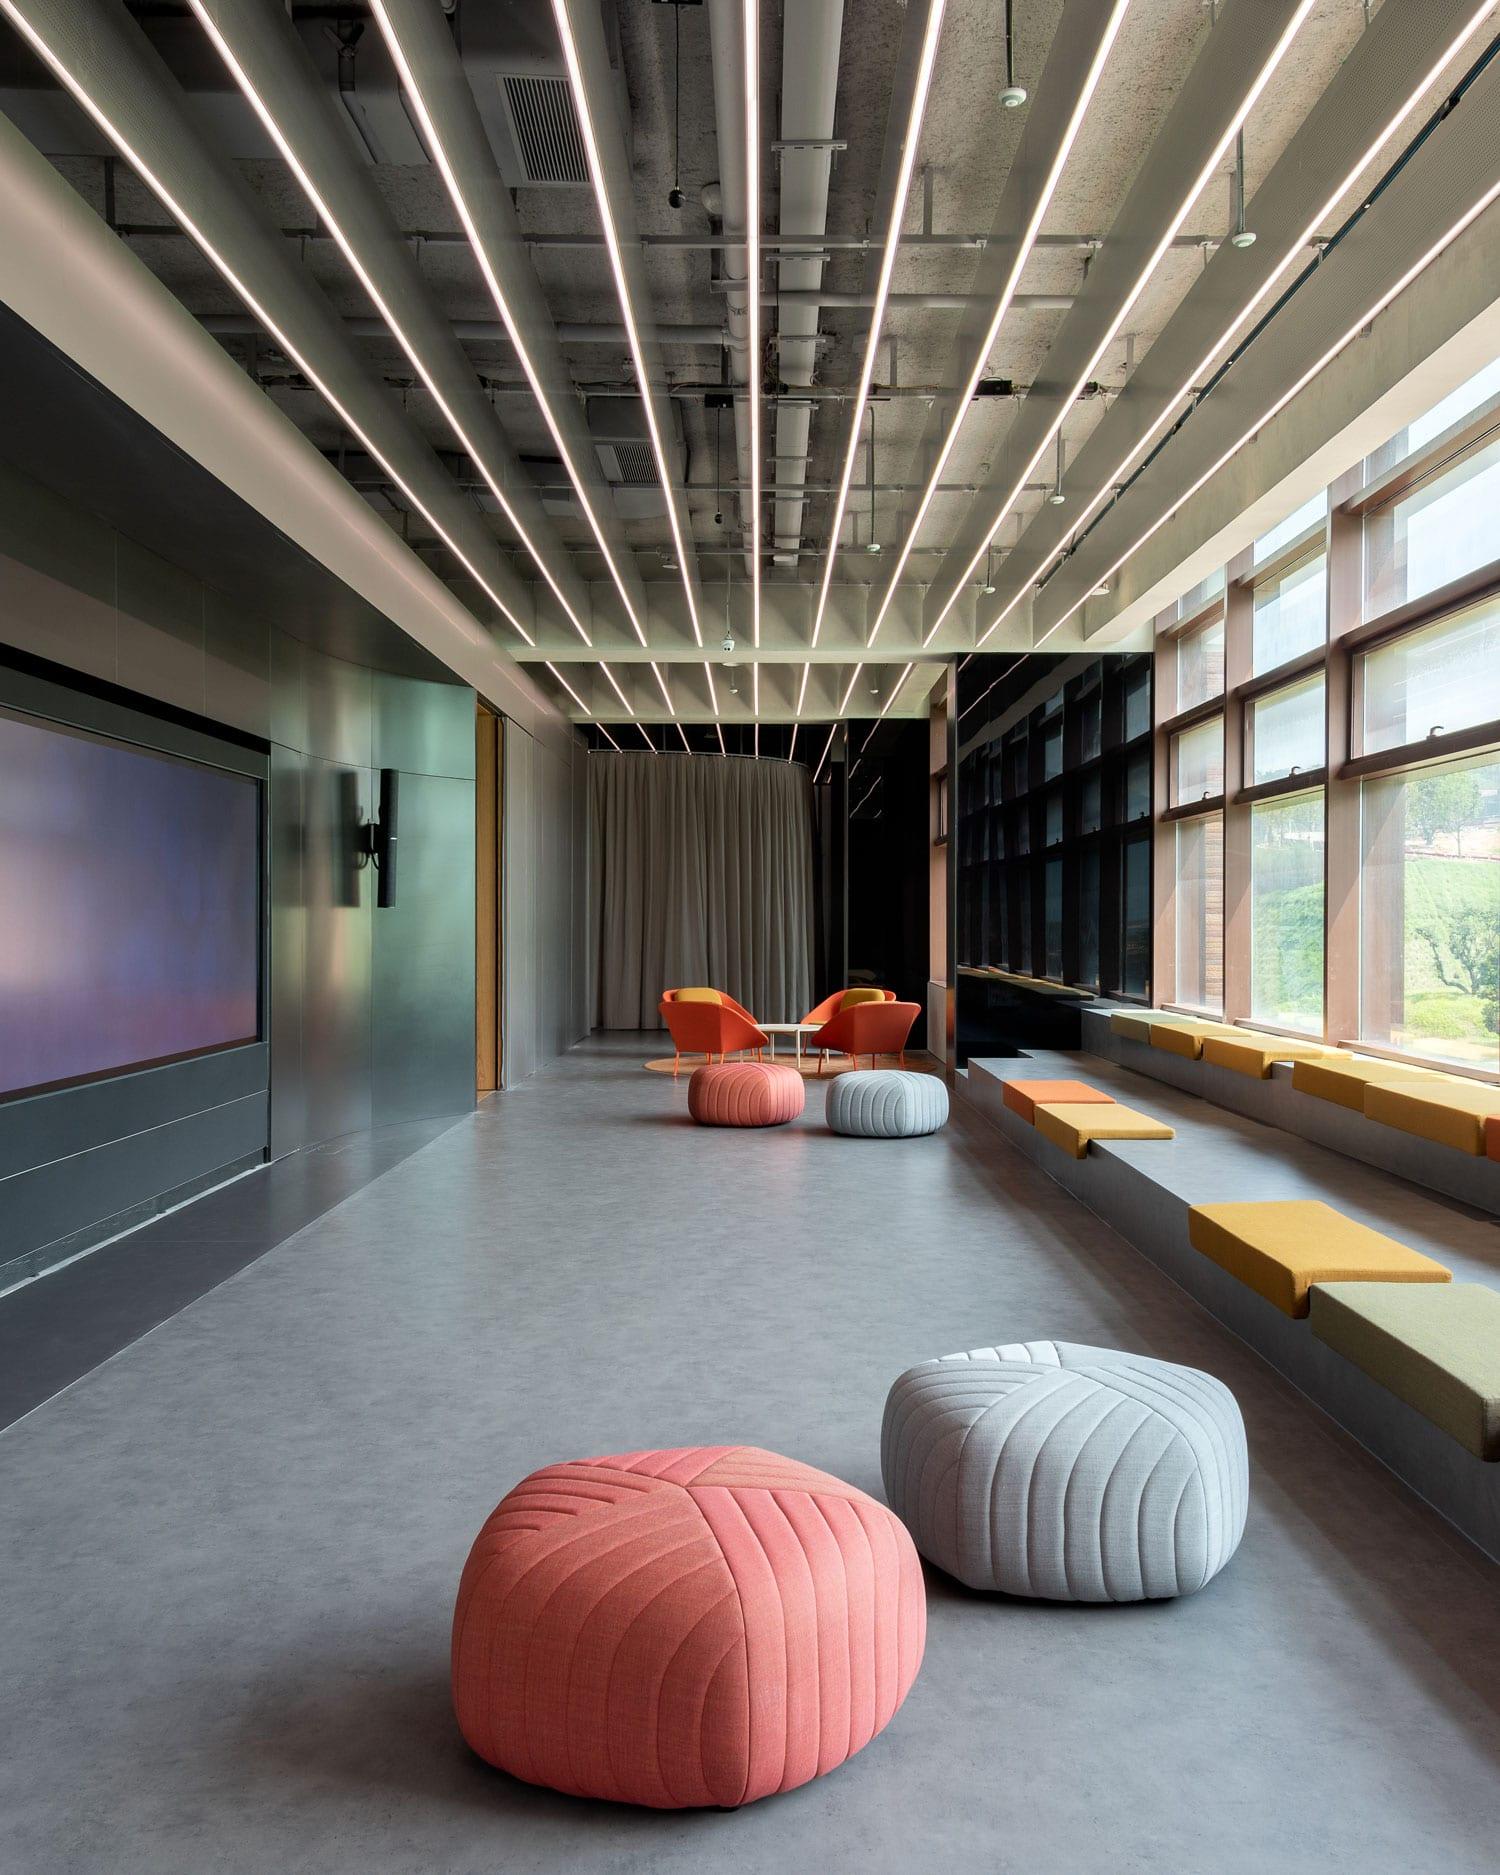 architecture aw raics innovation - 736×920